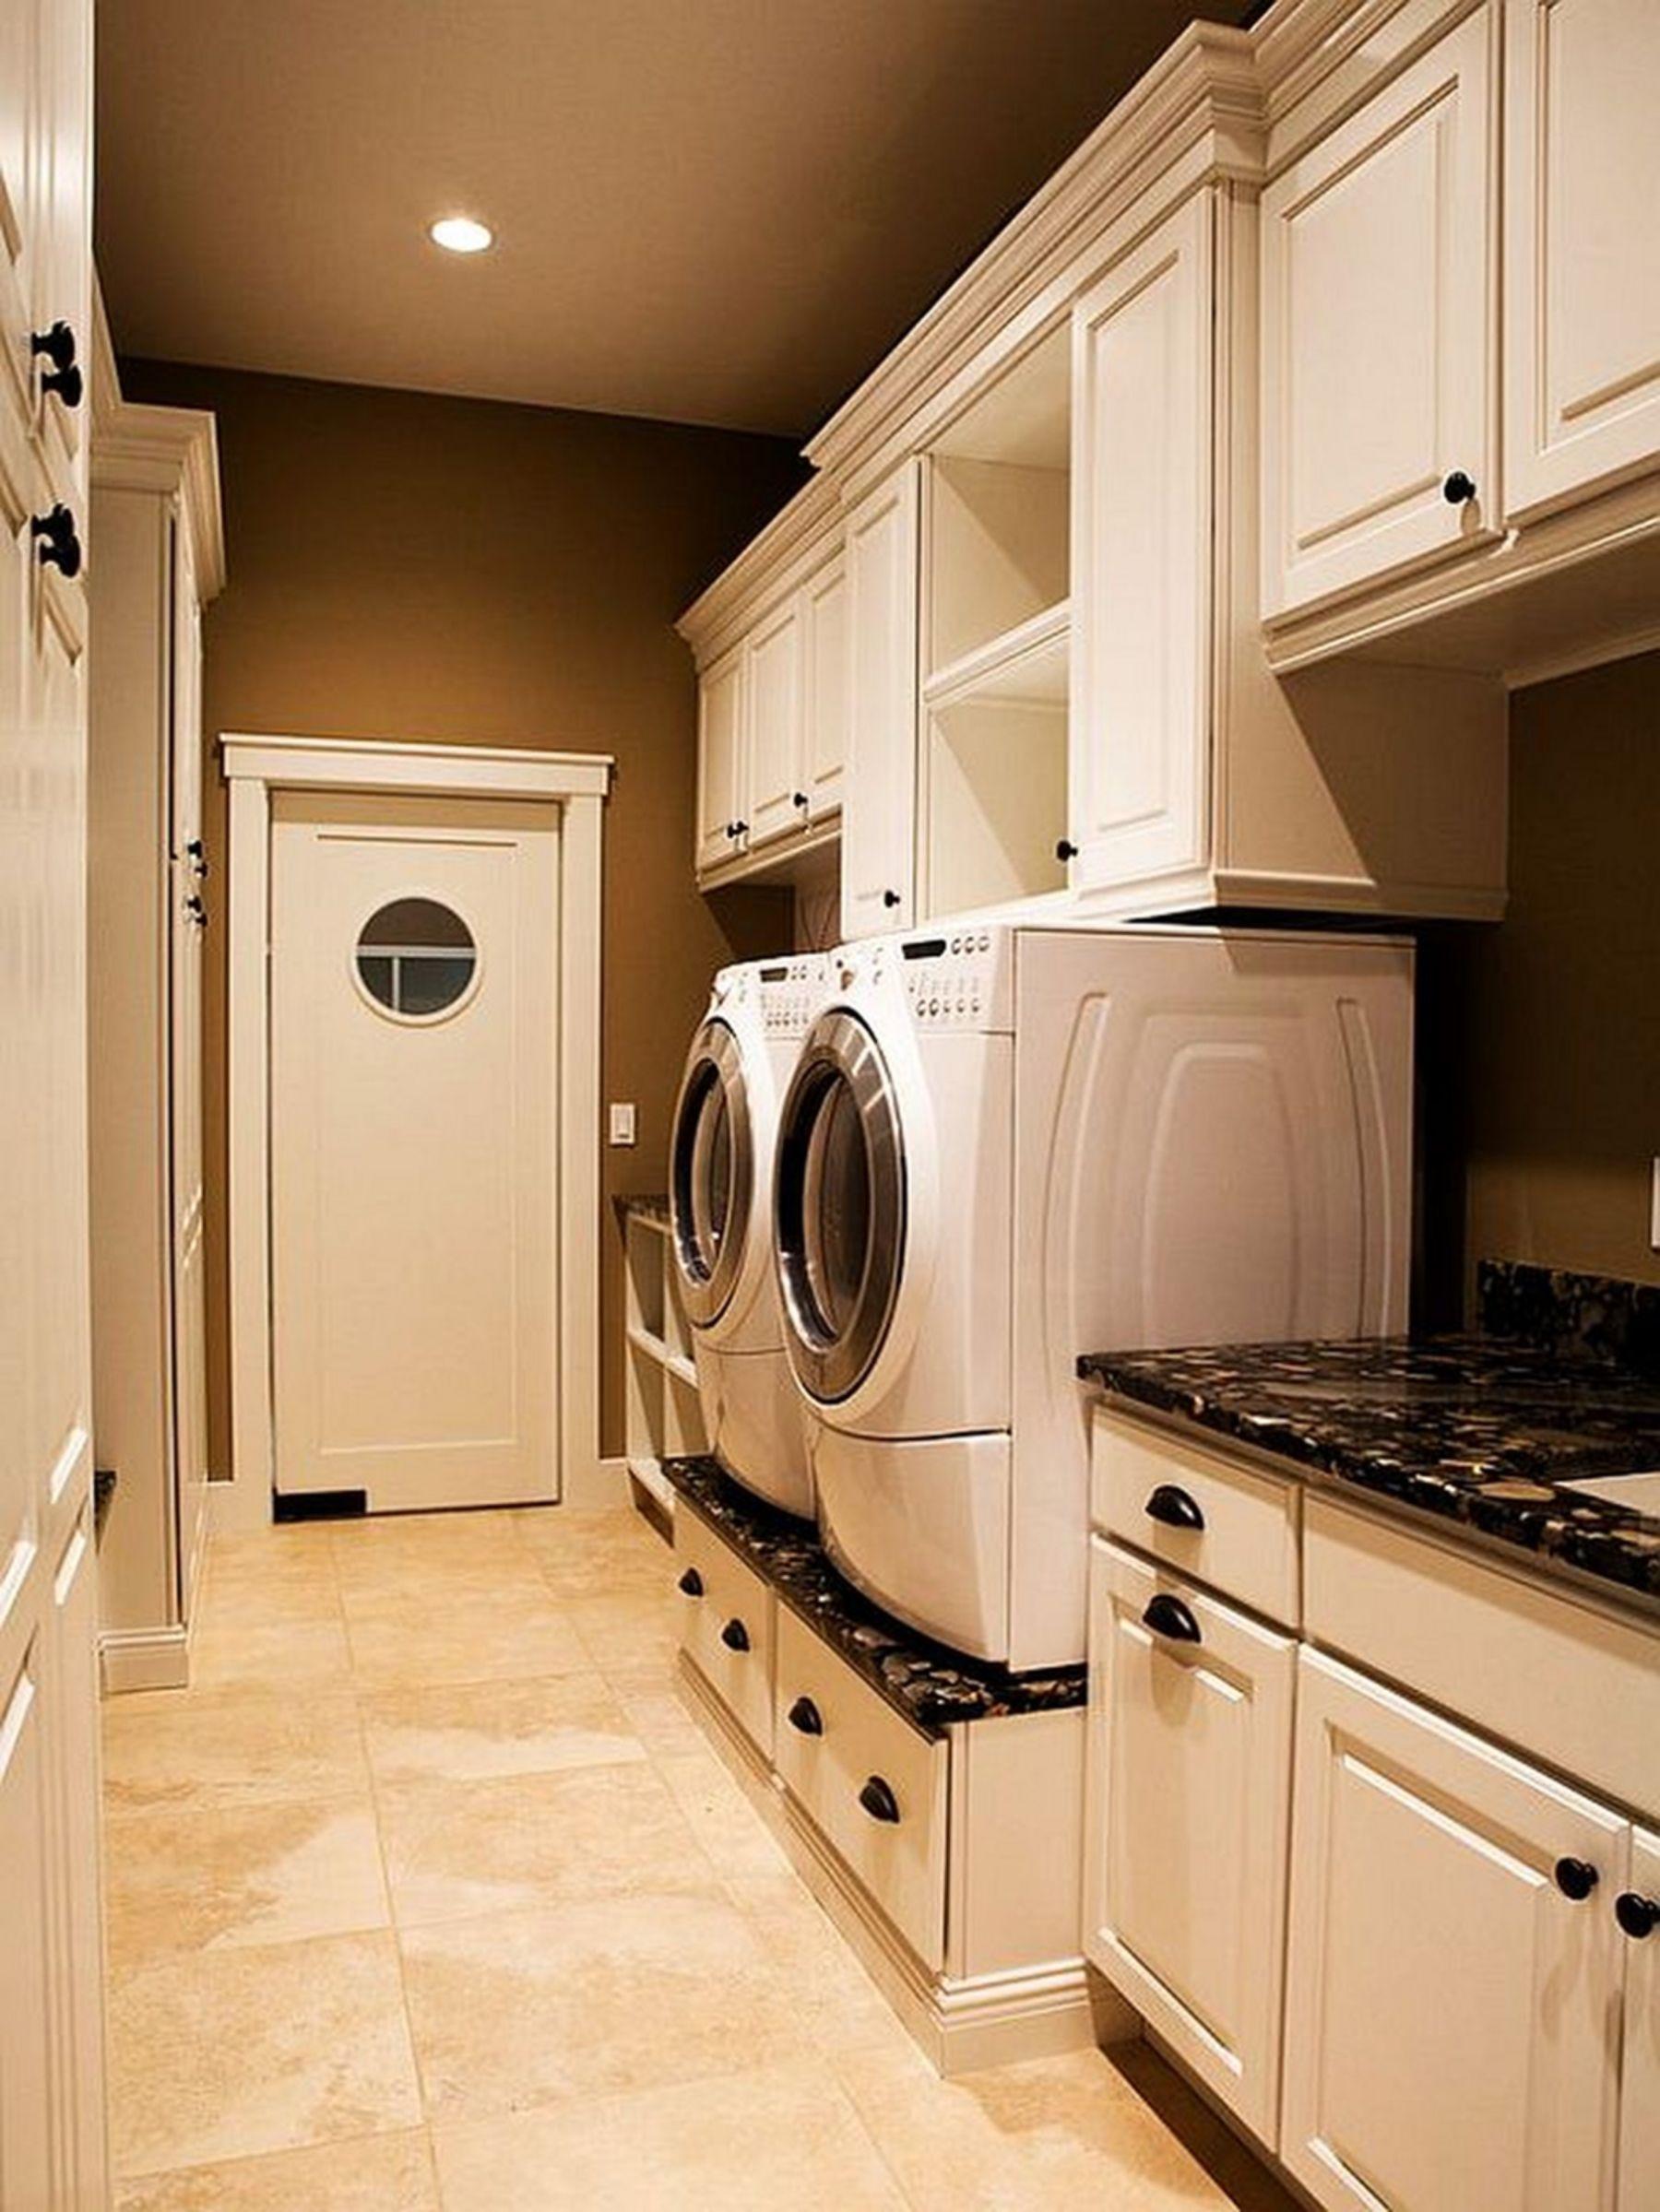 12 stunning minimalist laundry room design ideas to